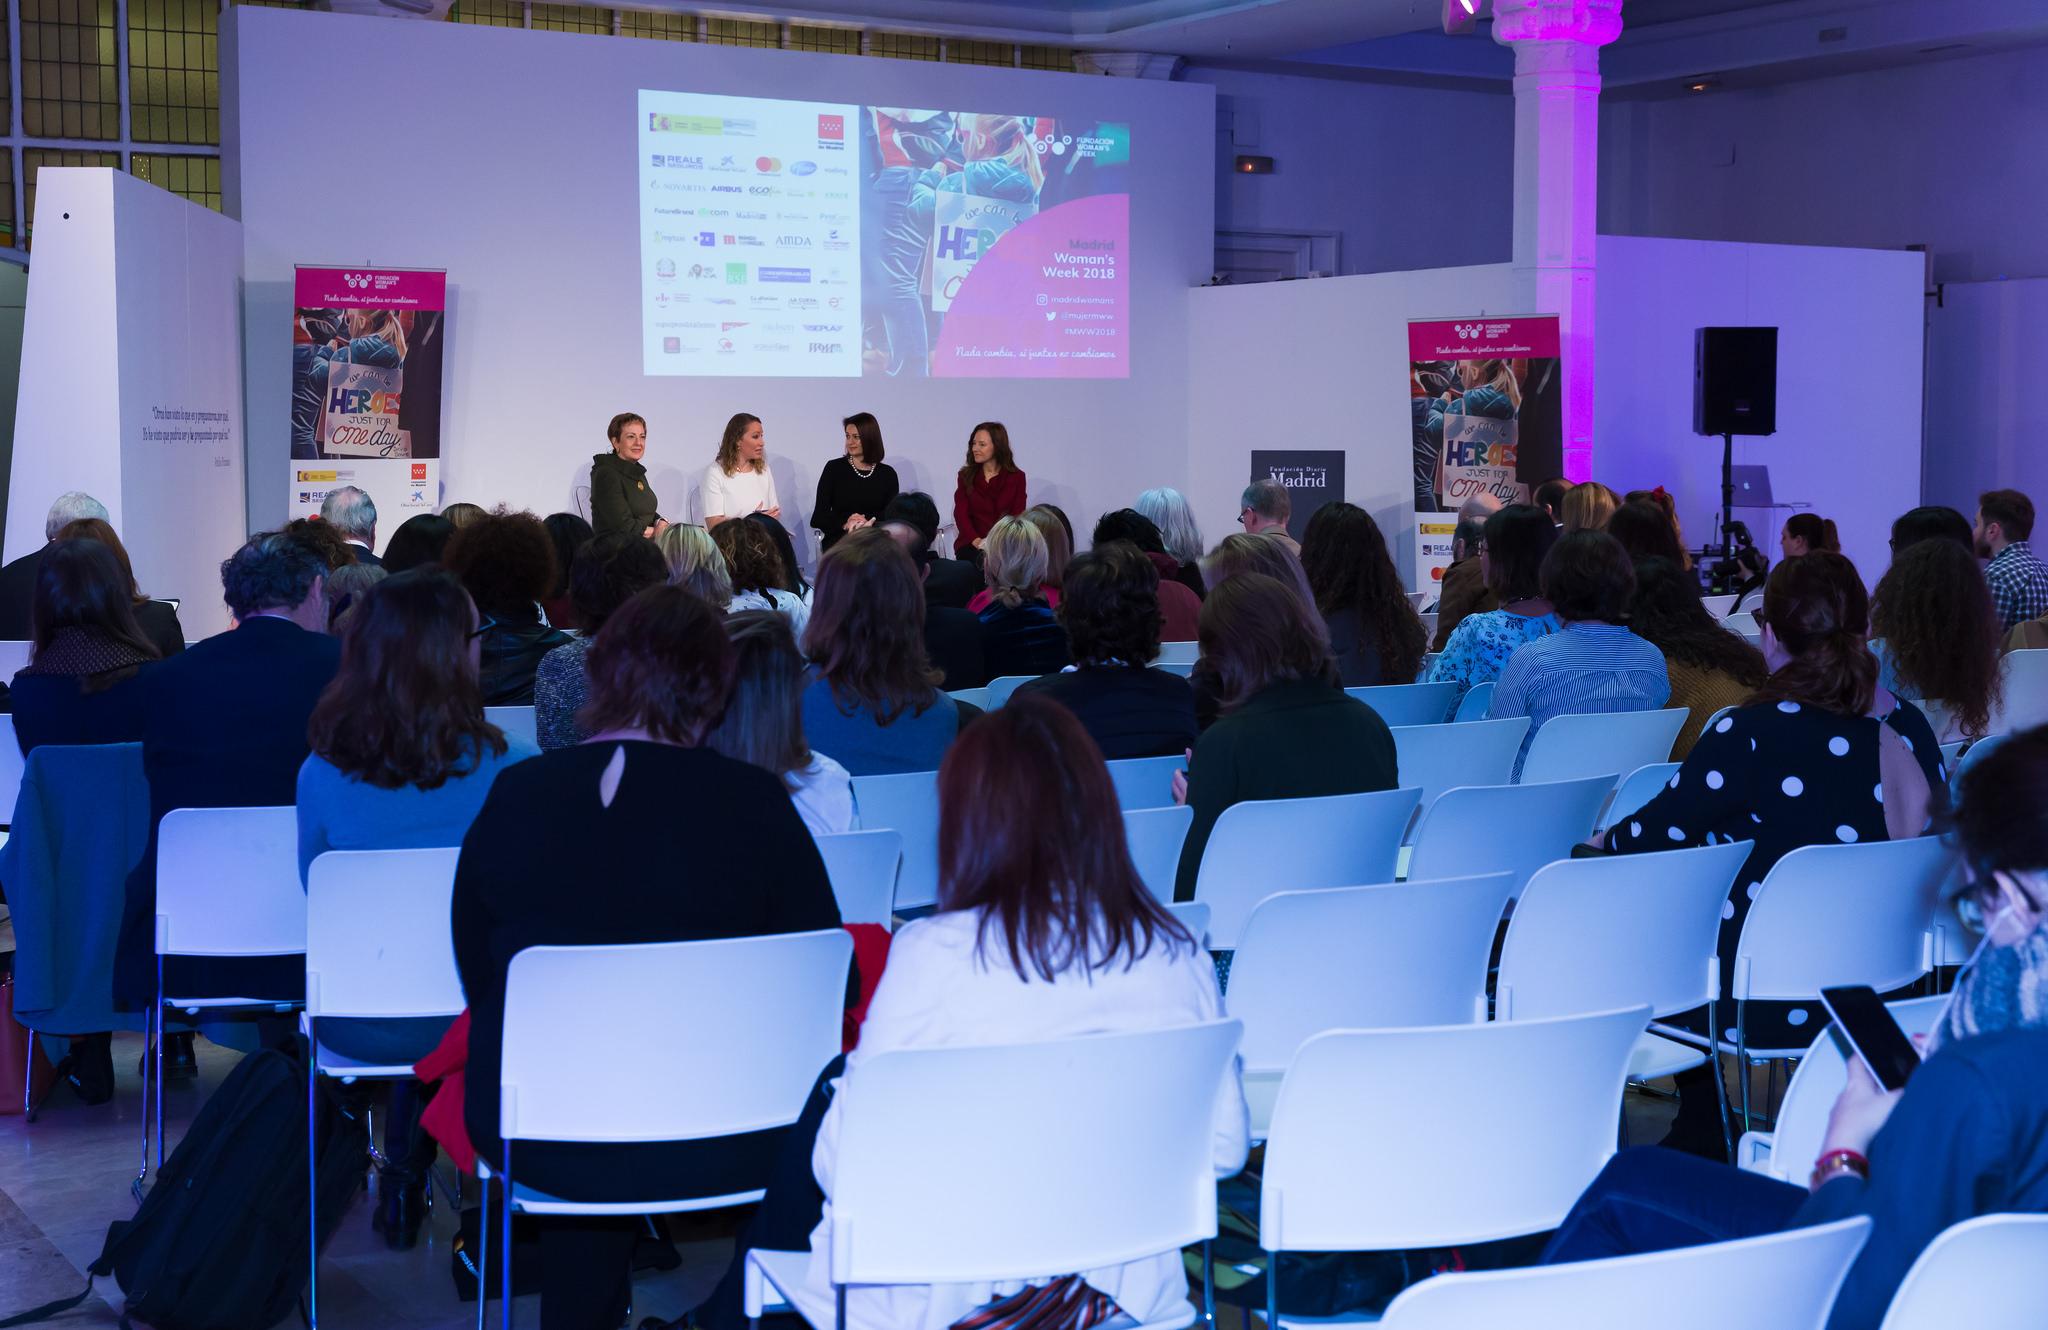 Mesa de debate sobre Diplomacia en femenino durante Madrid Woman's Week 2018